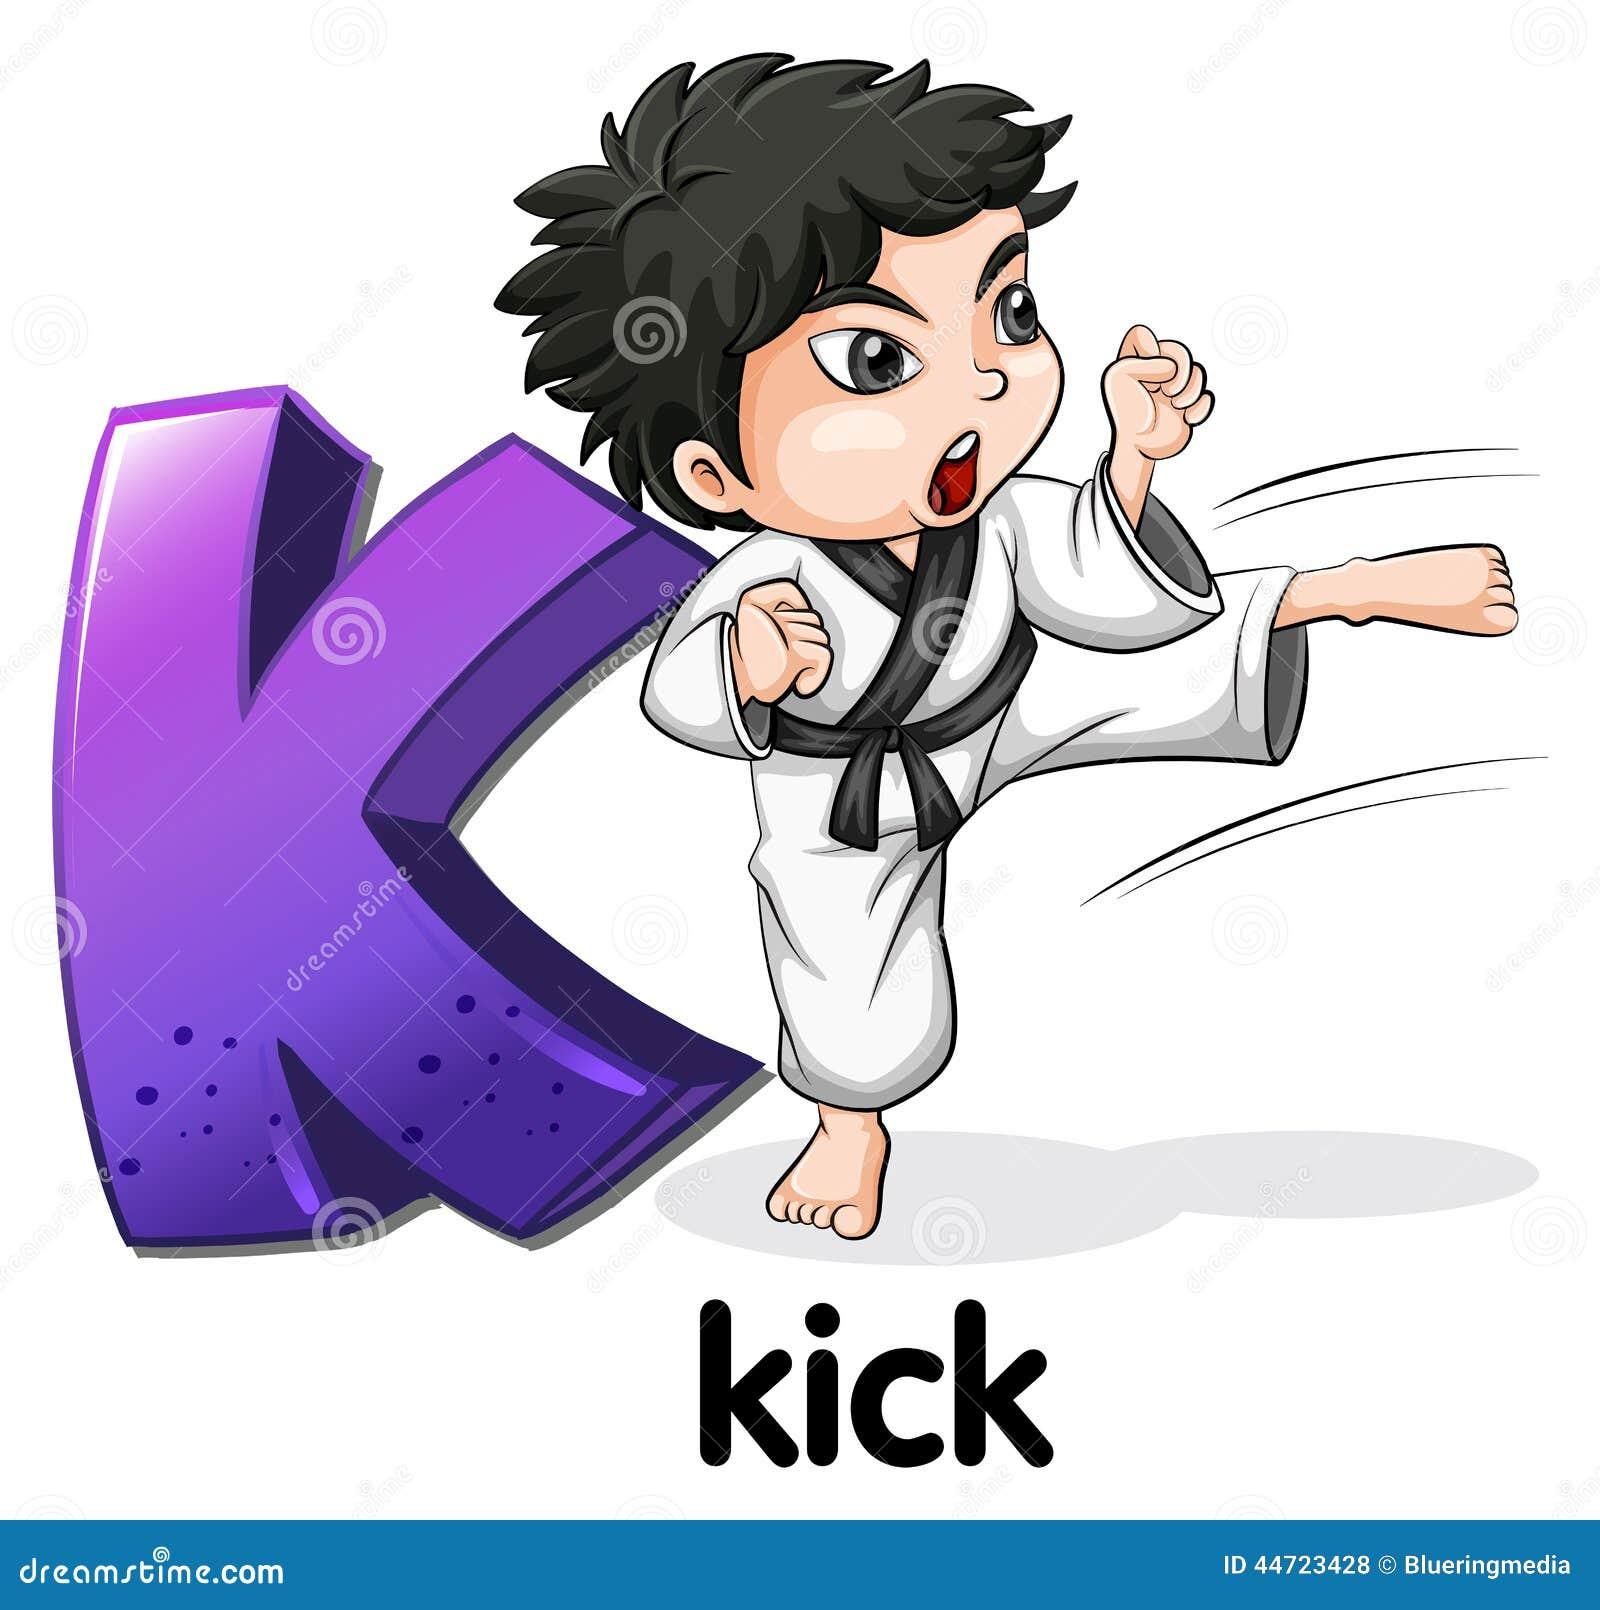 A Letter K For Kick